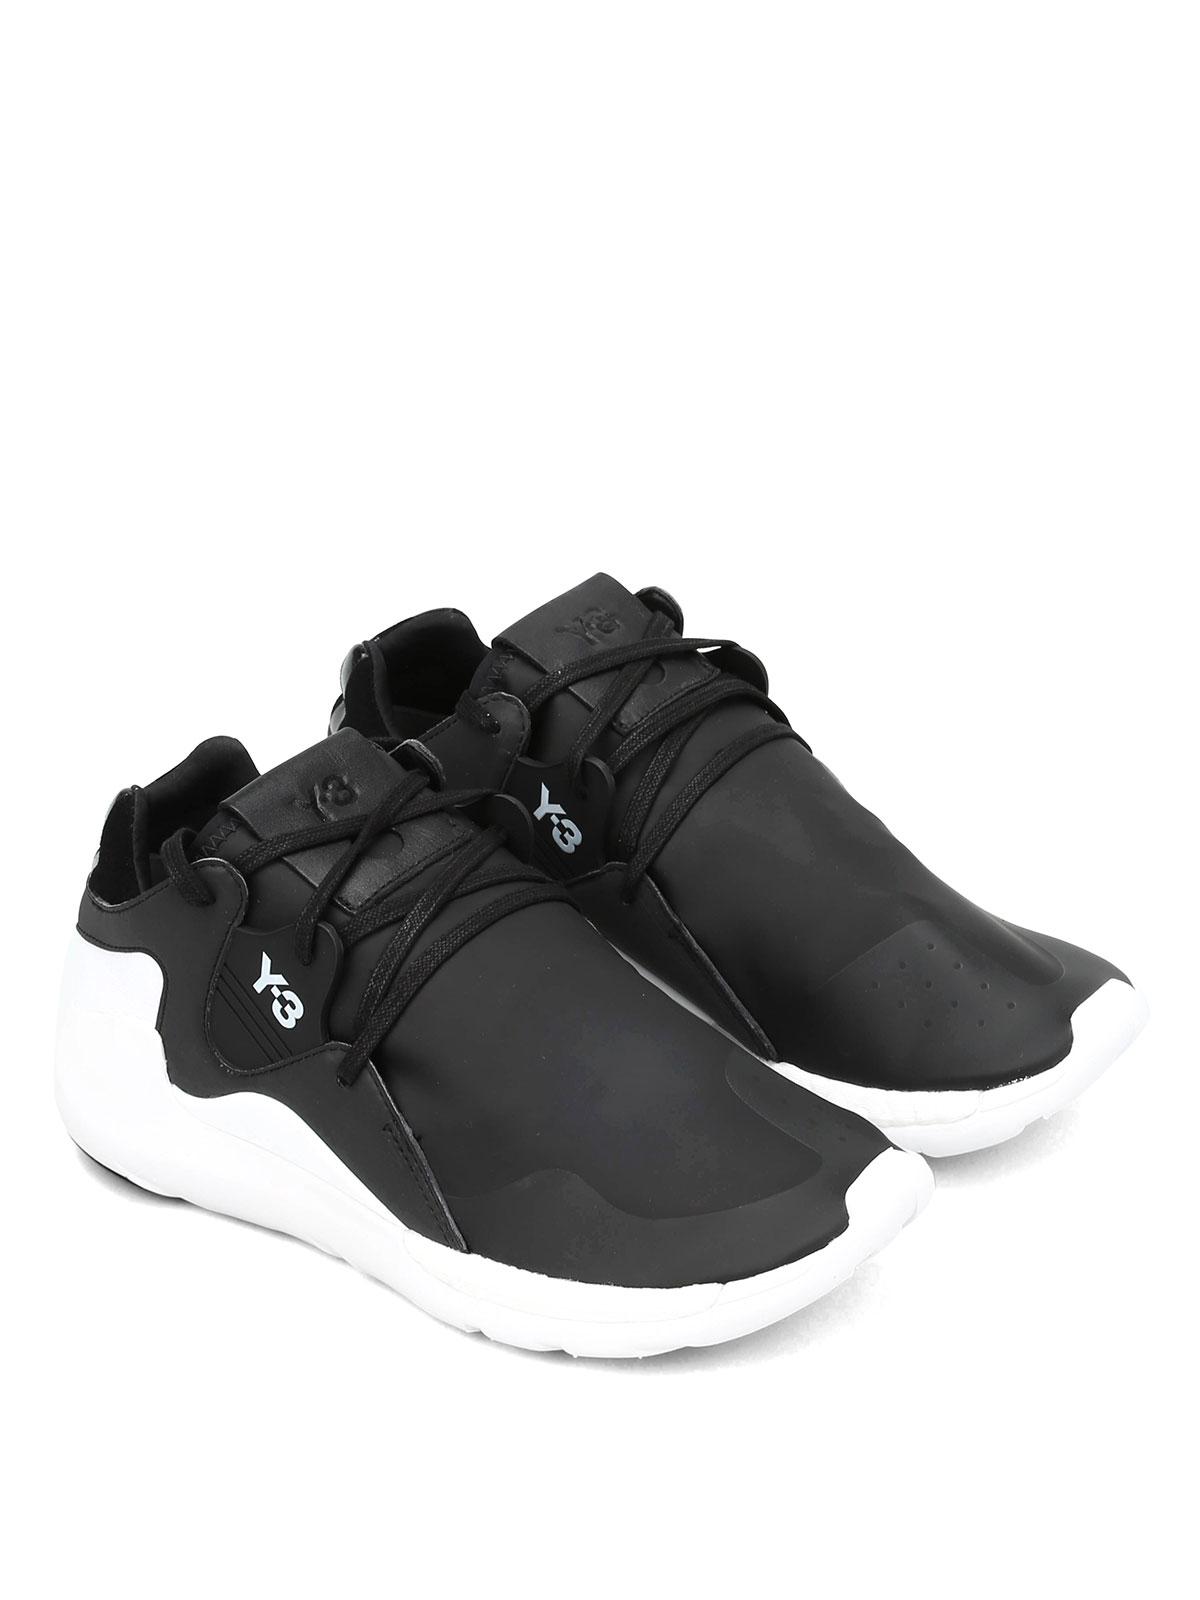 15fc4605c5072 Adidas Y-3 - Qr Run sneakers - trainers - BB4730